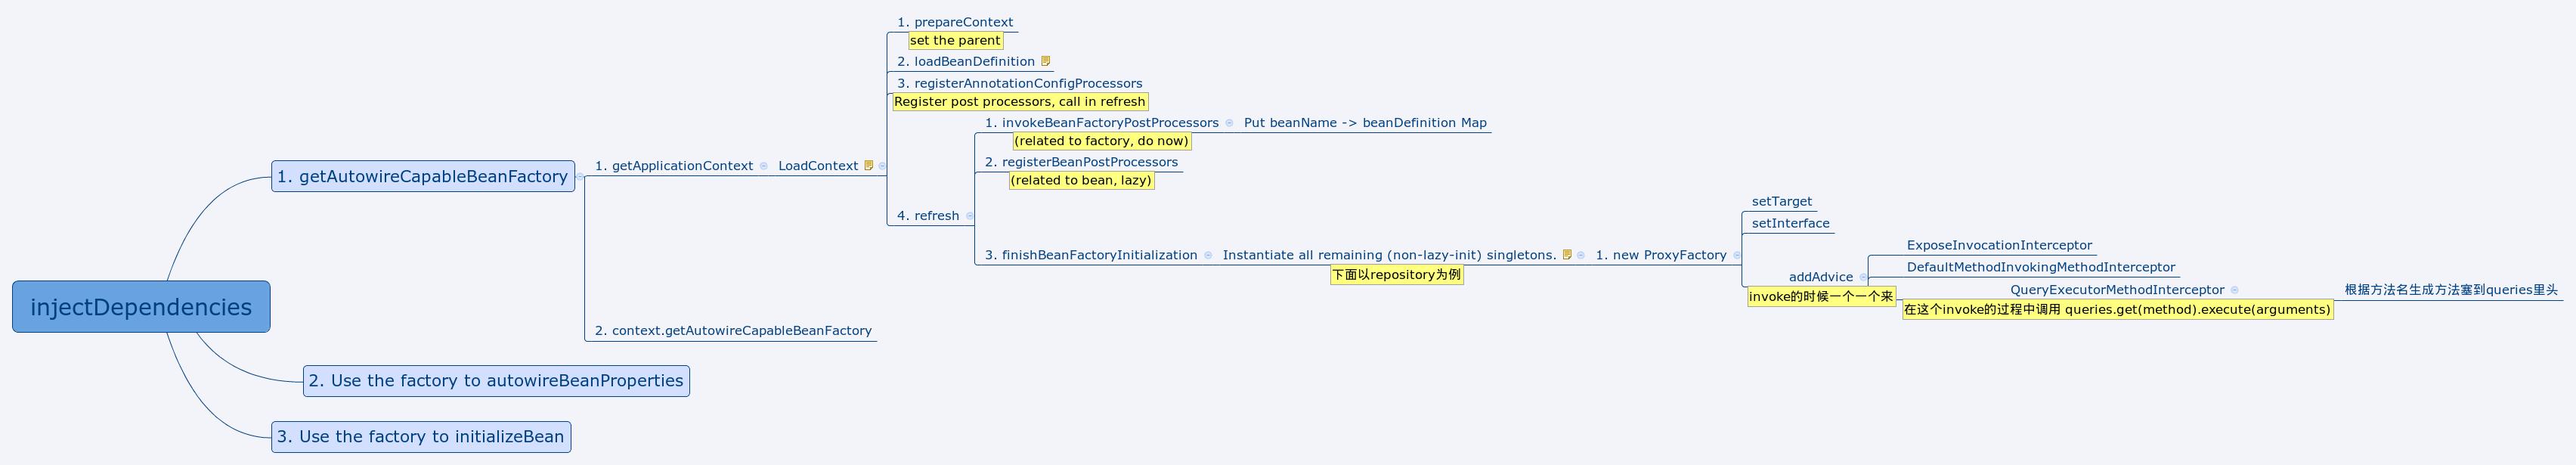 Spring-data-elastic-search初始化流程